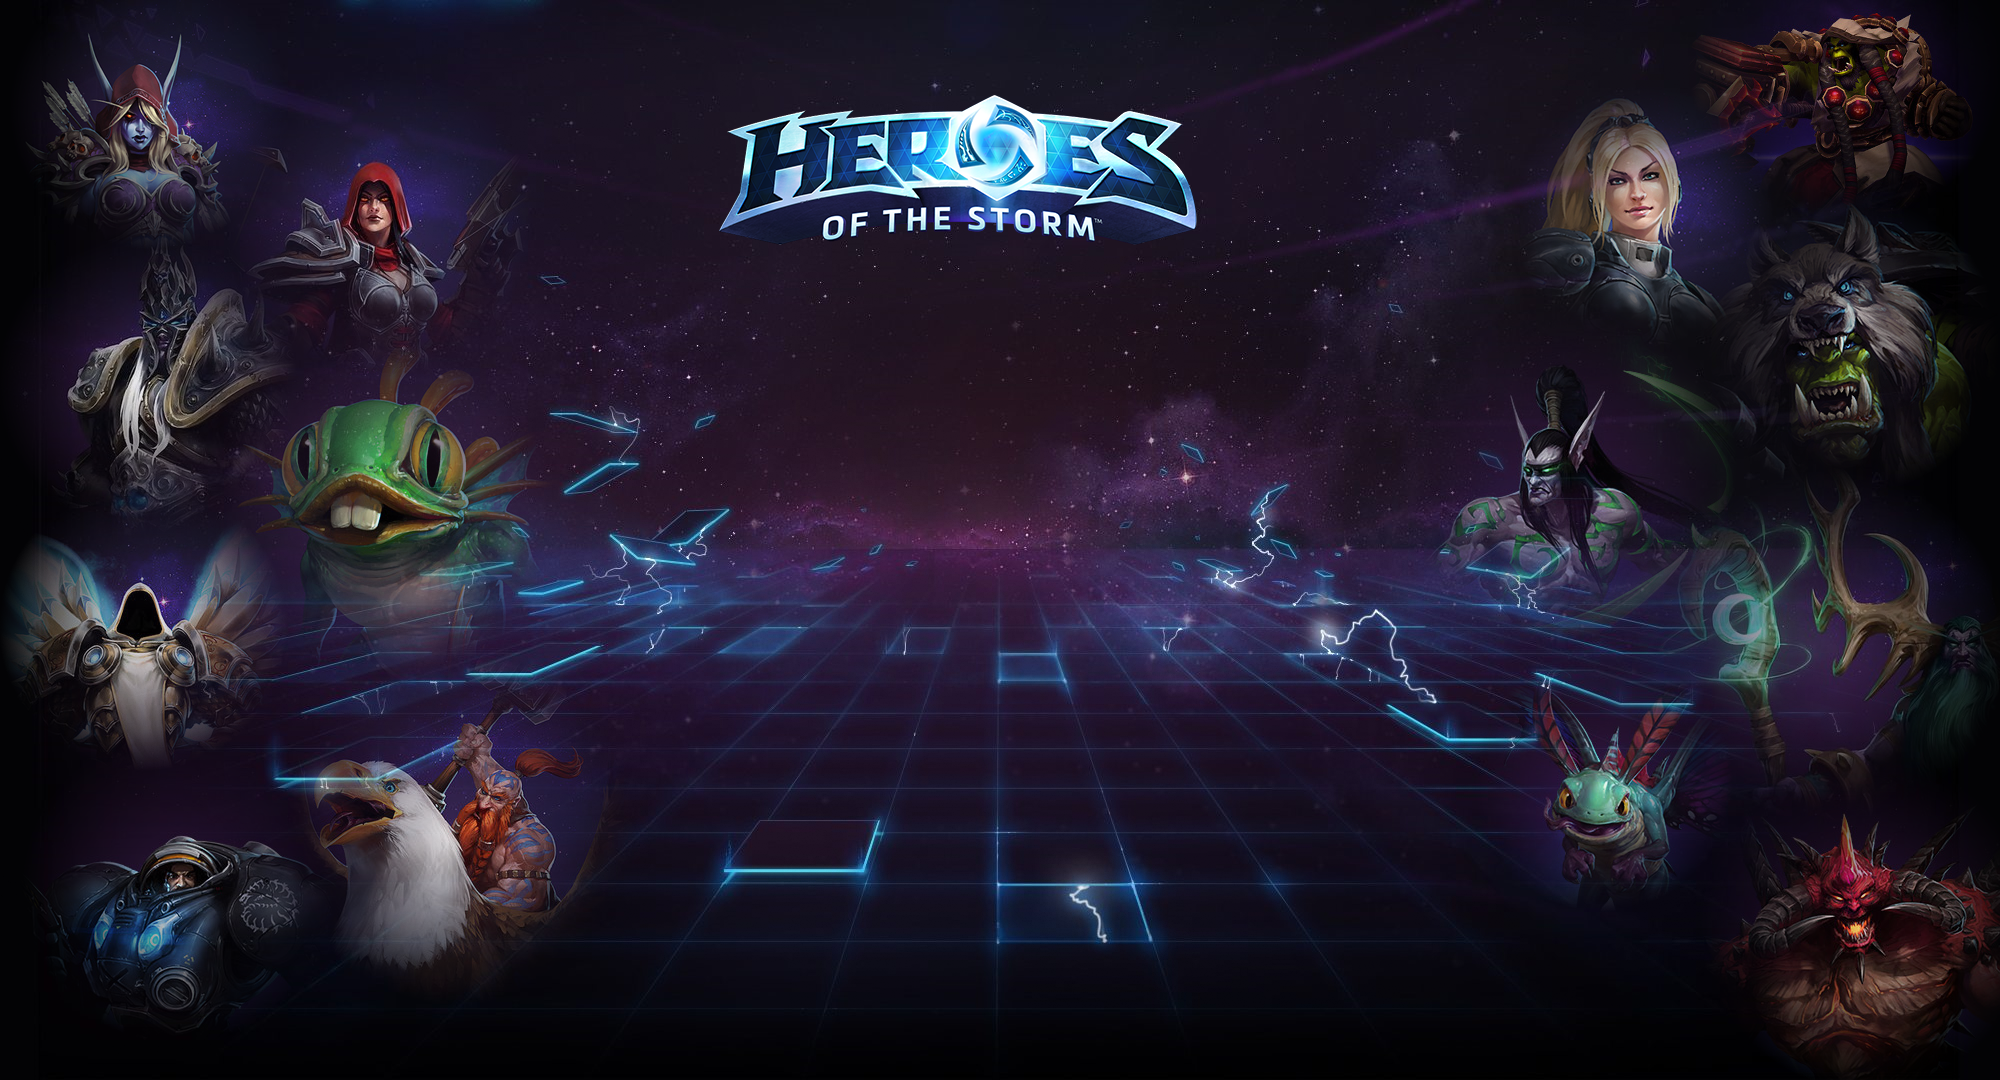 Heroes Of The Storm Into The Nexus Wallpaper By Leepiin On Deviantart